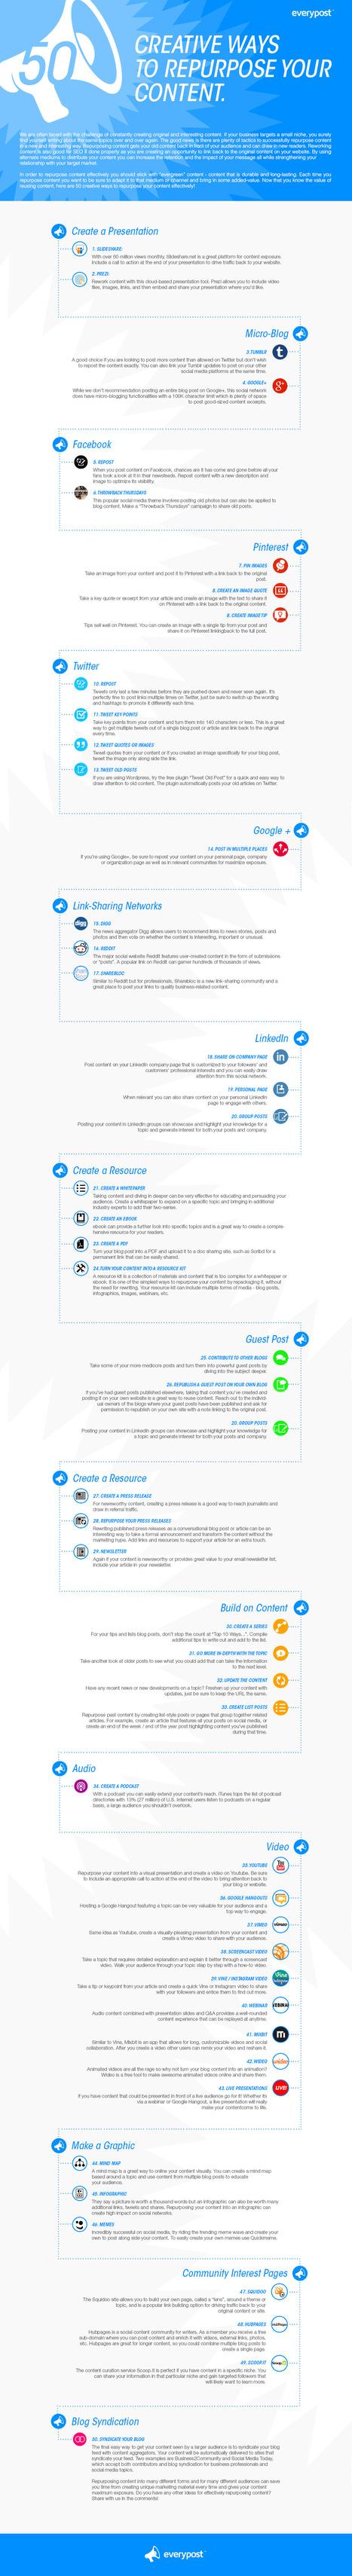 50 Creative Ways To Repurpose Your Content (Infographic) - EveryPost | #TheMarketingTechAlert | educational technology | Scoop.it